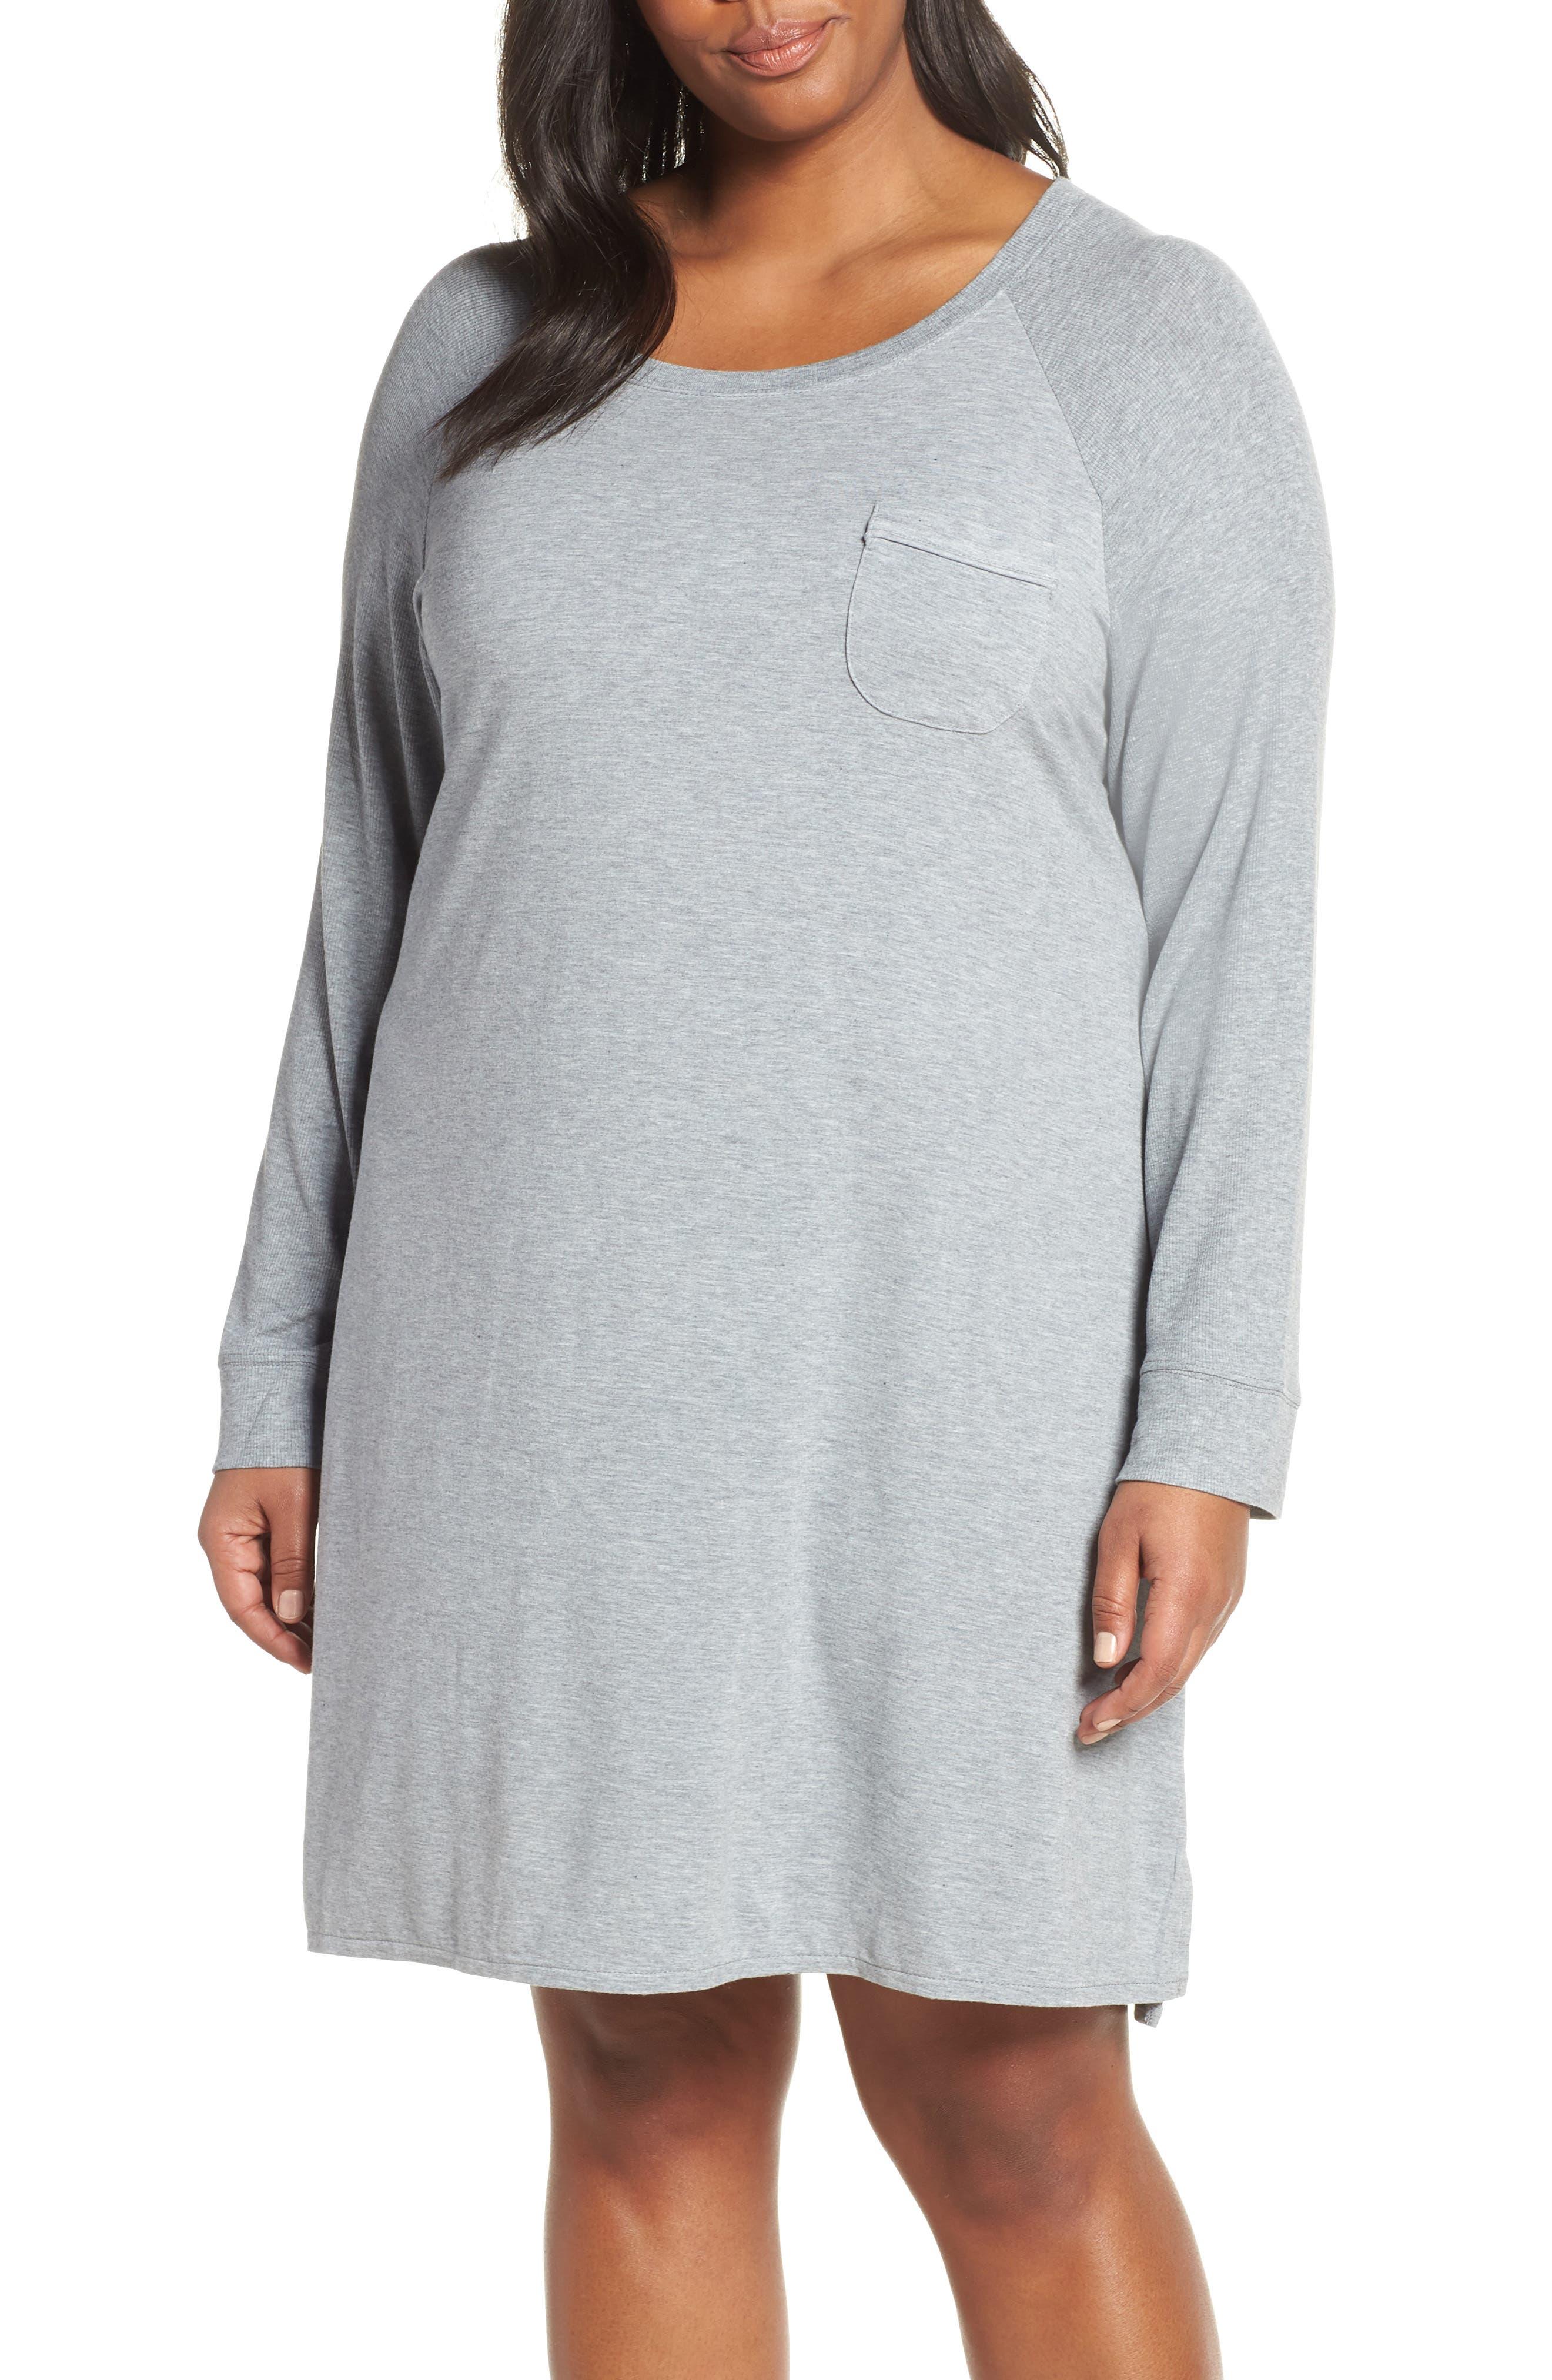 Breathe Sleep Shirt,                         Main,                         color, GREY STEEL HEATHER